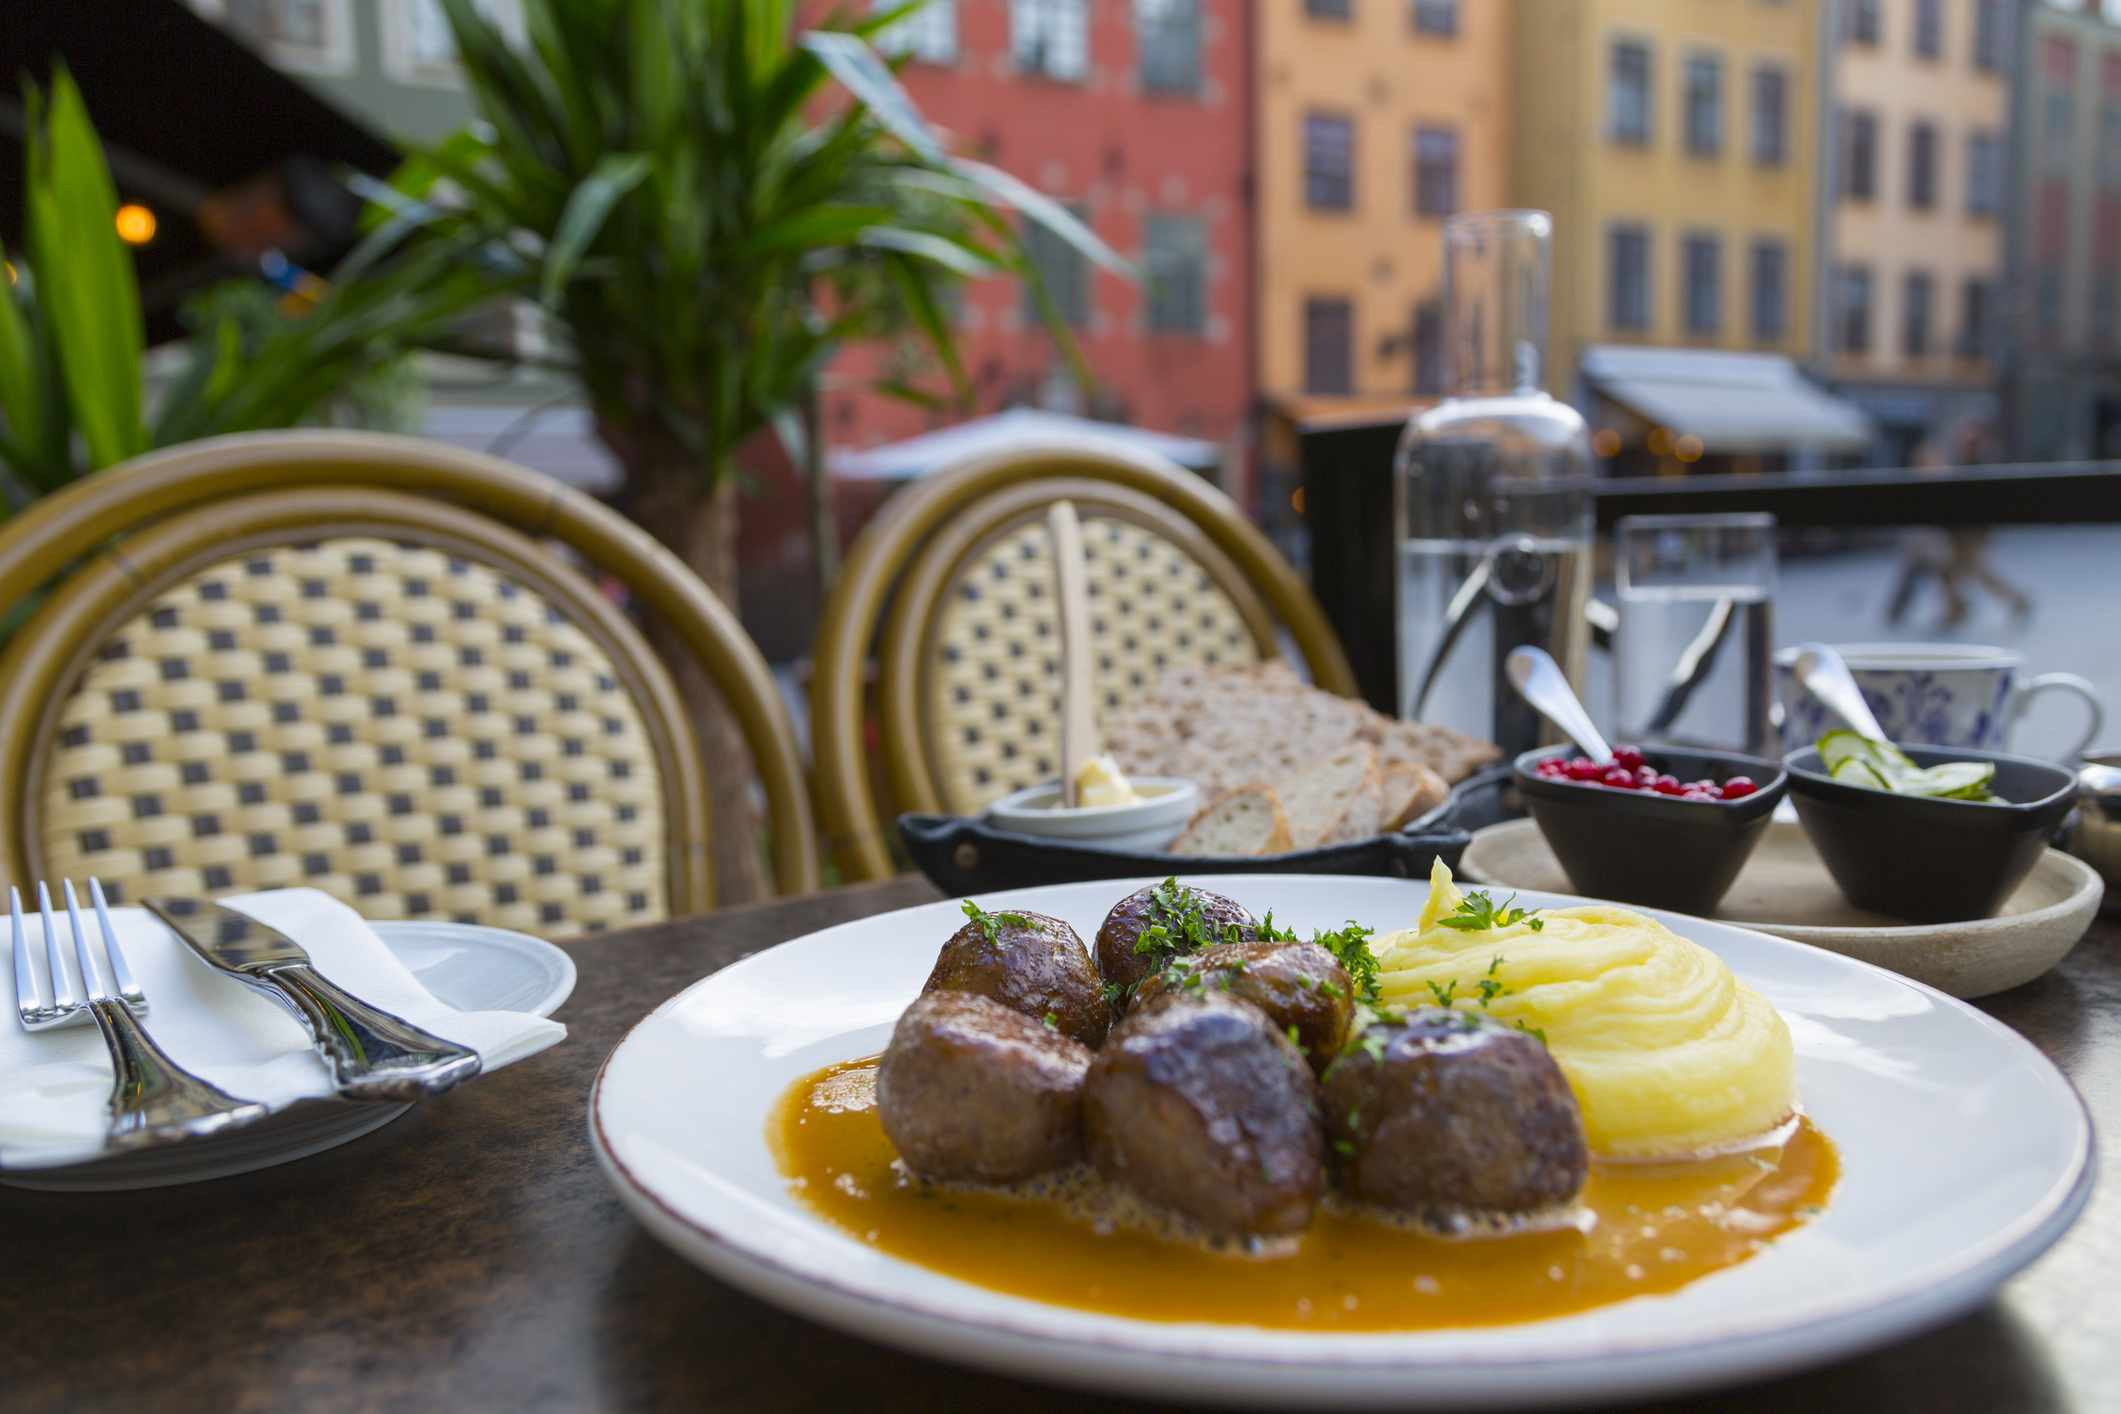 Traditional Swedish dish of meatballs